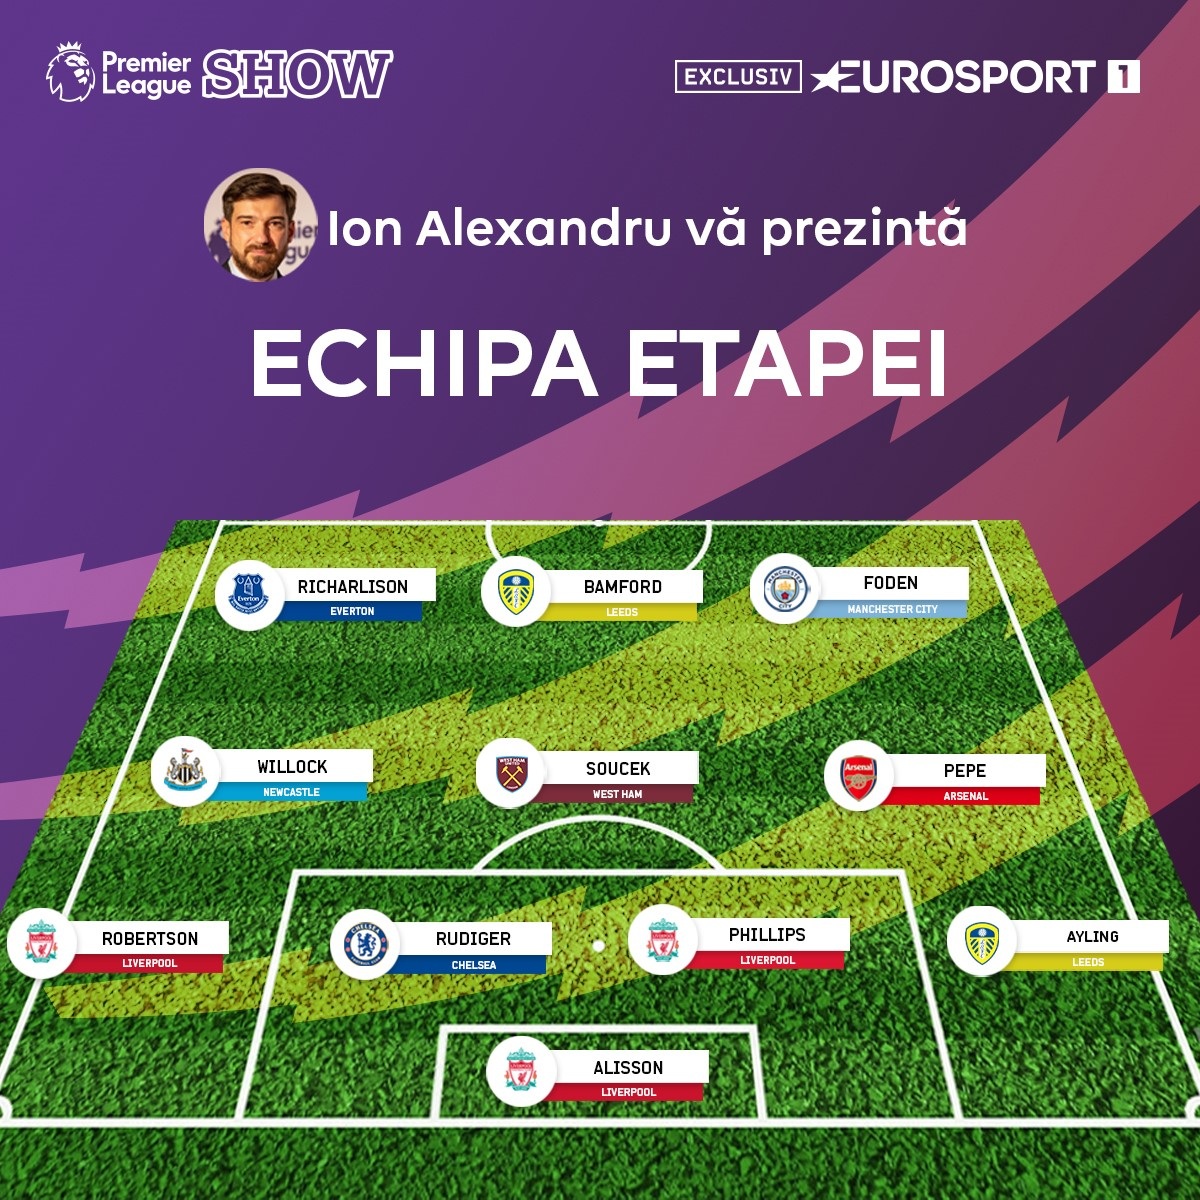 https://i.eurosport.com/2021/05/20/3136195.jpg